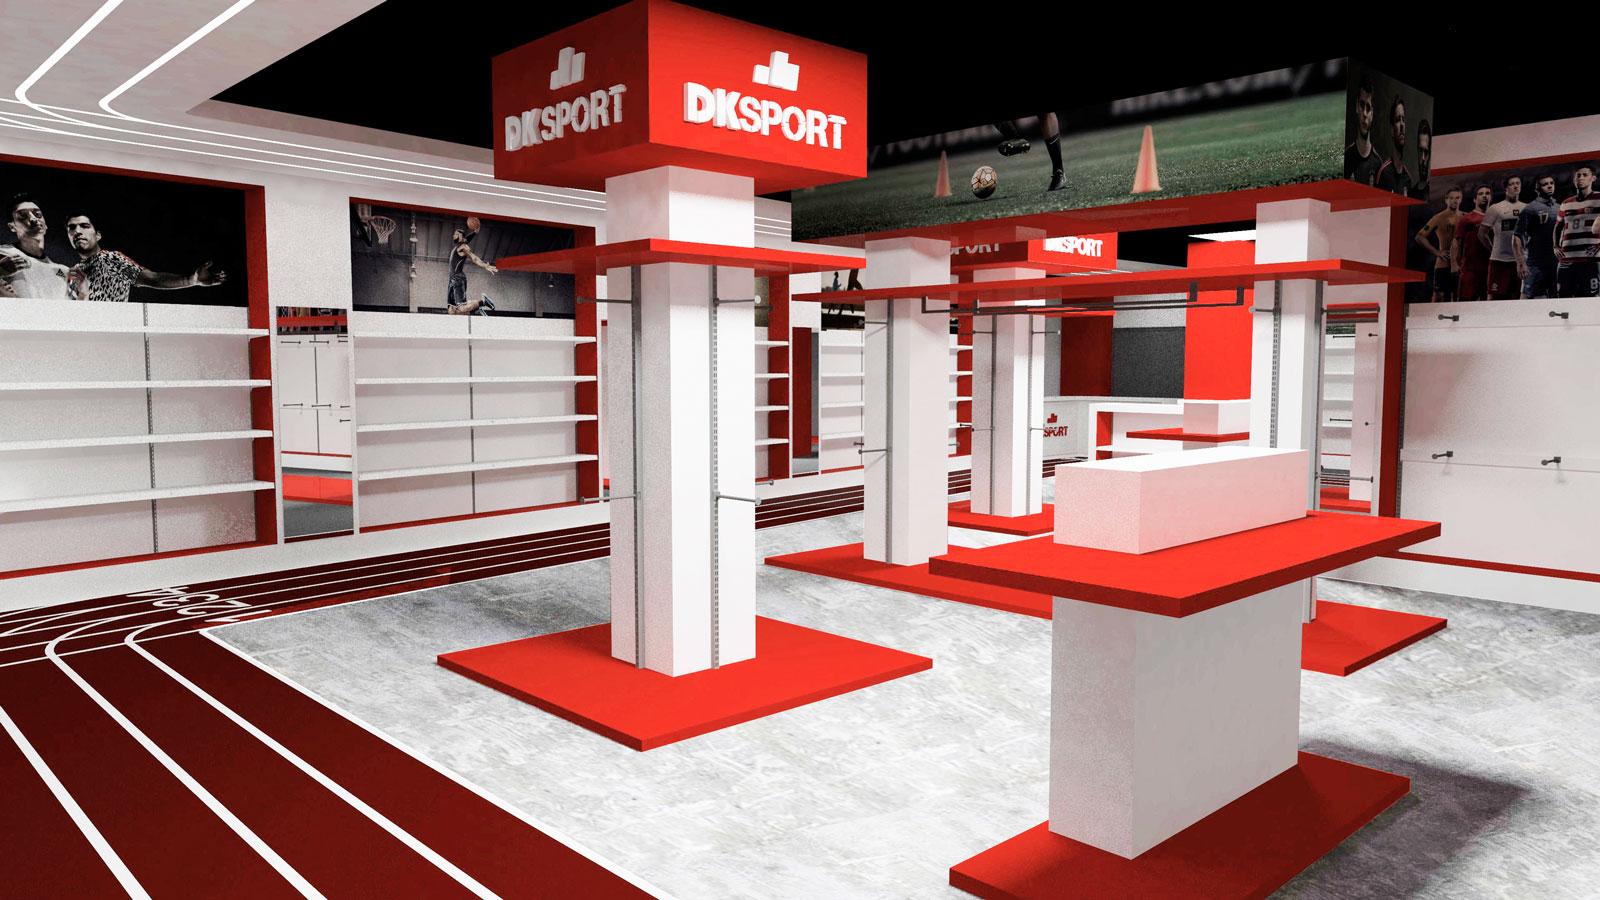 Dksport-B